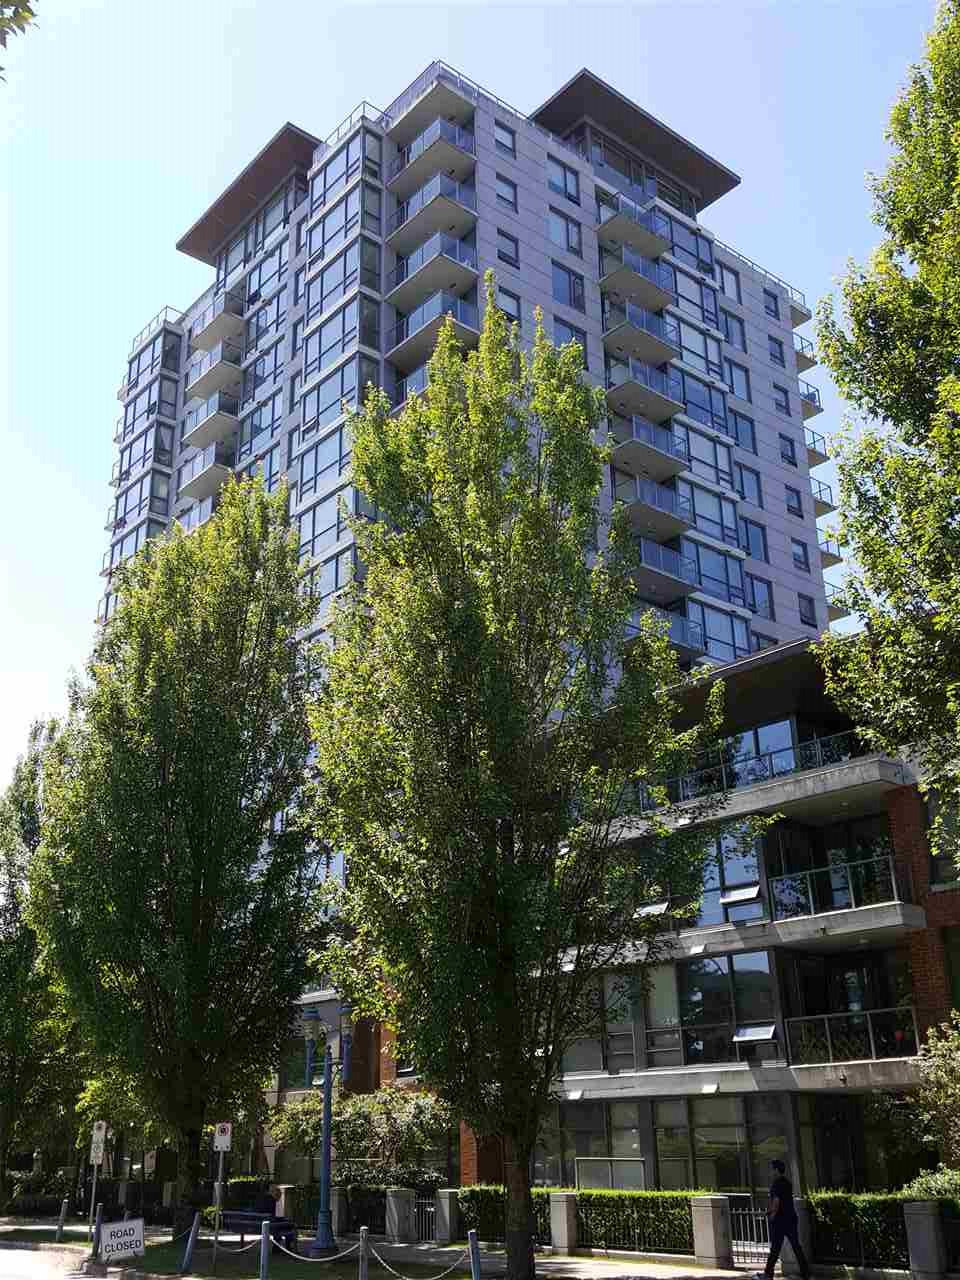 Condo Apartment at 102 6331 BUSWELL STREET, Unit 102, Richmond, British Columbia. Image 1